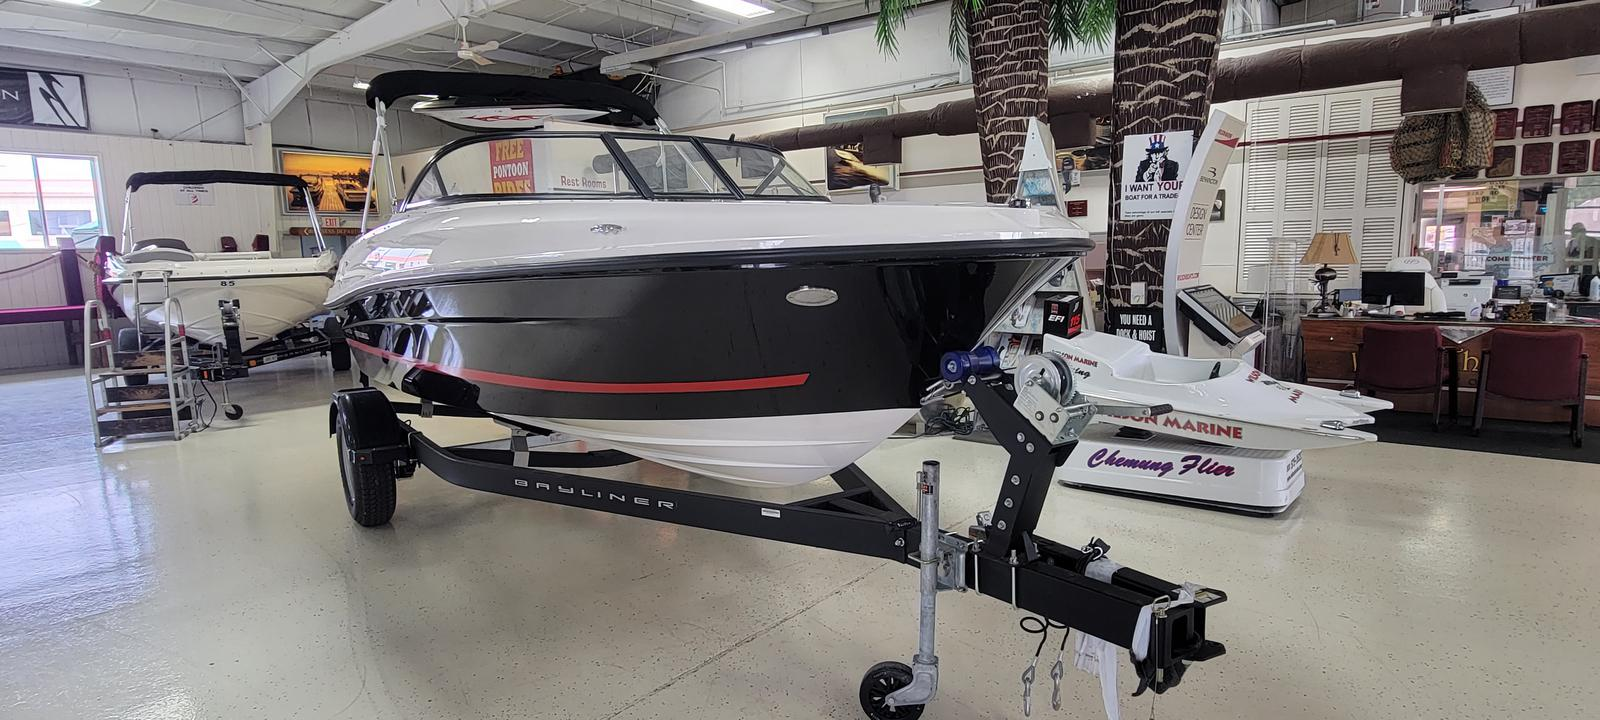 2021 Bayliner boat for sale, model of the boat is VR4 Bowrider & Image # 1 of 11